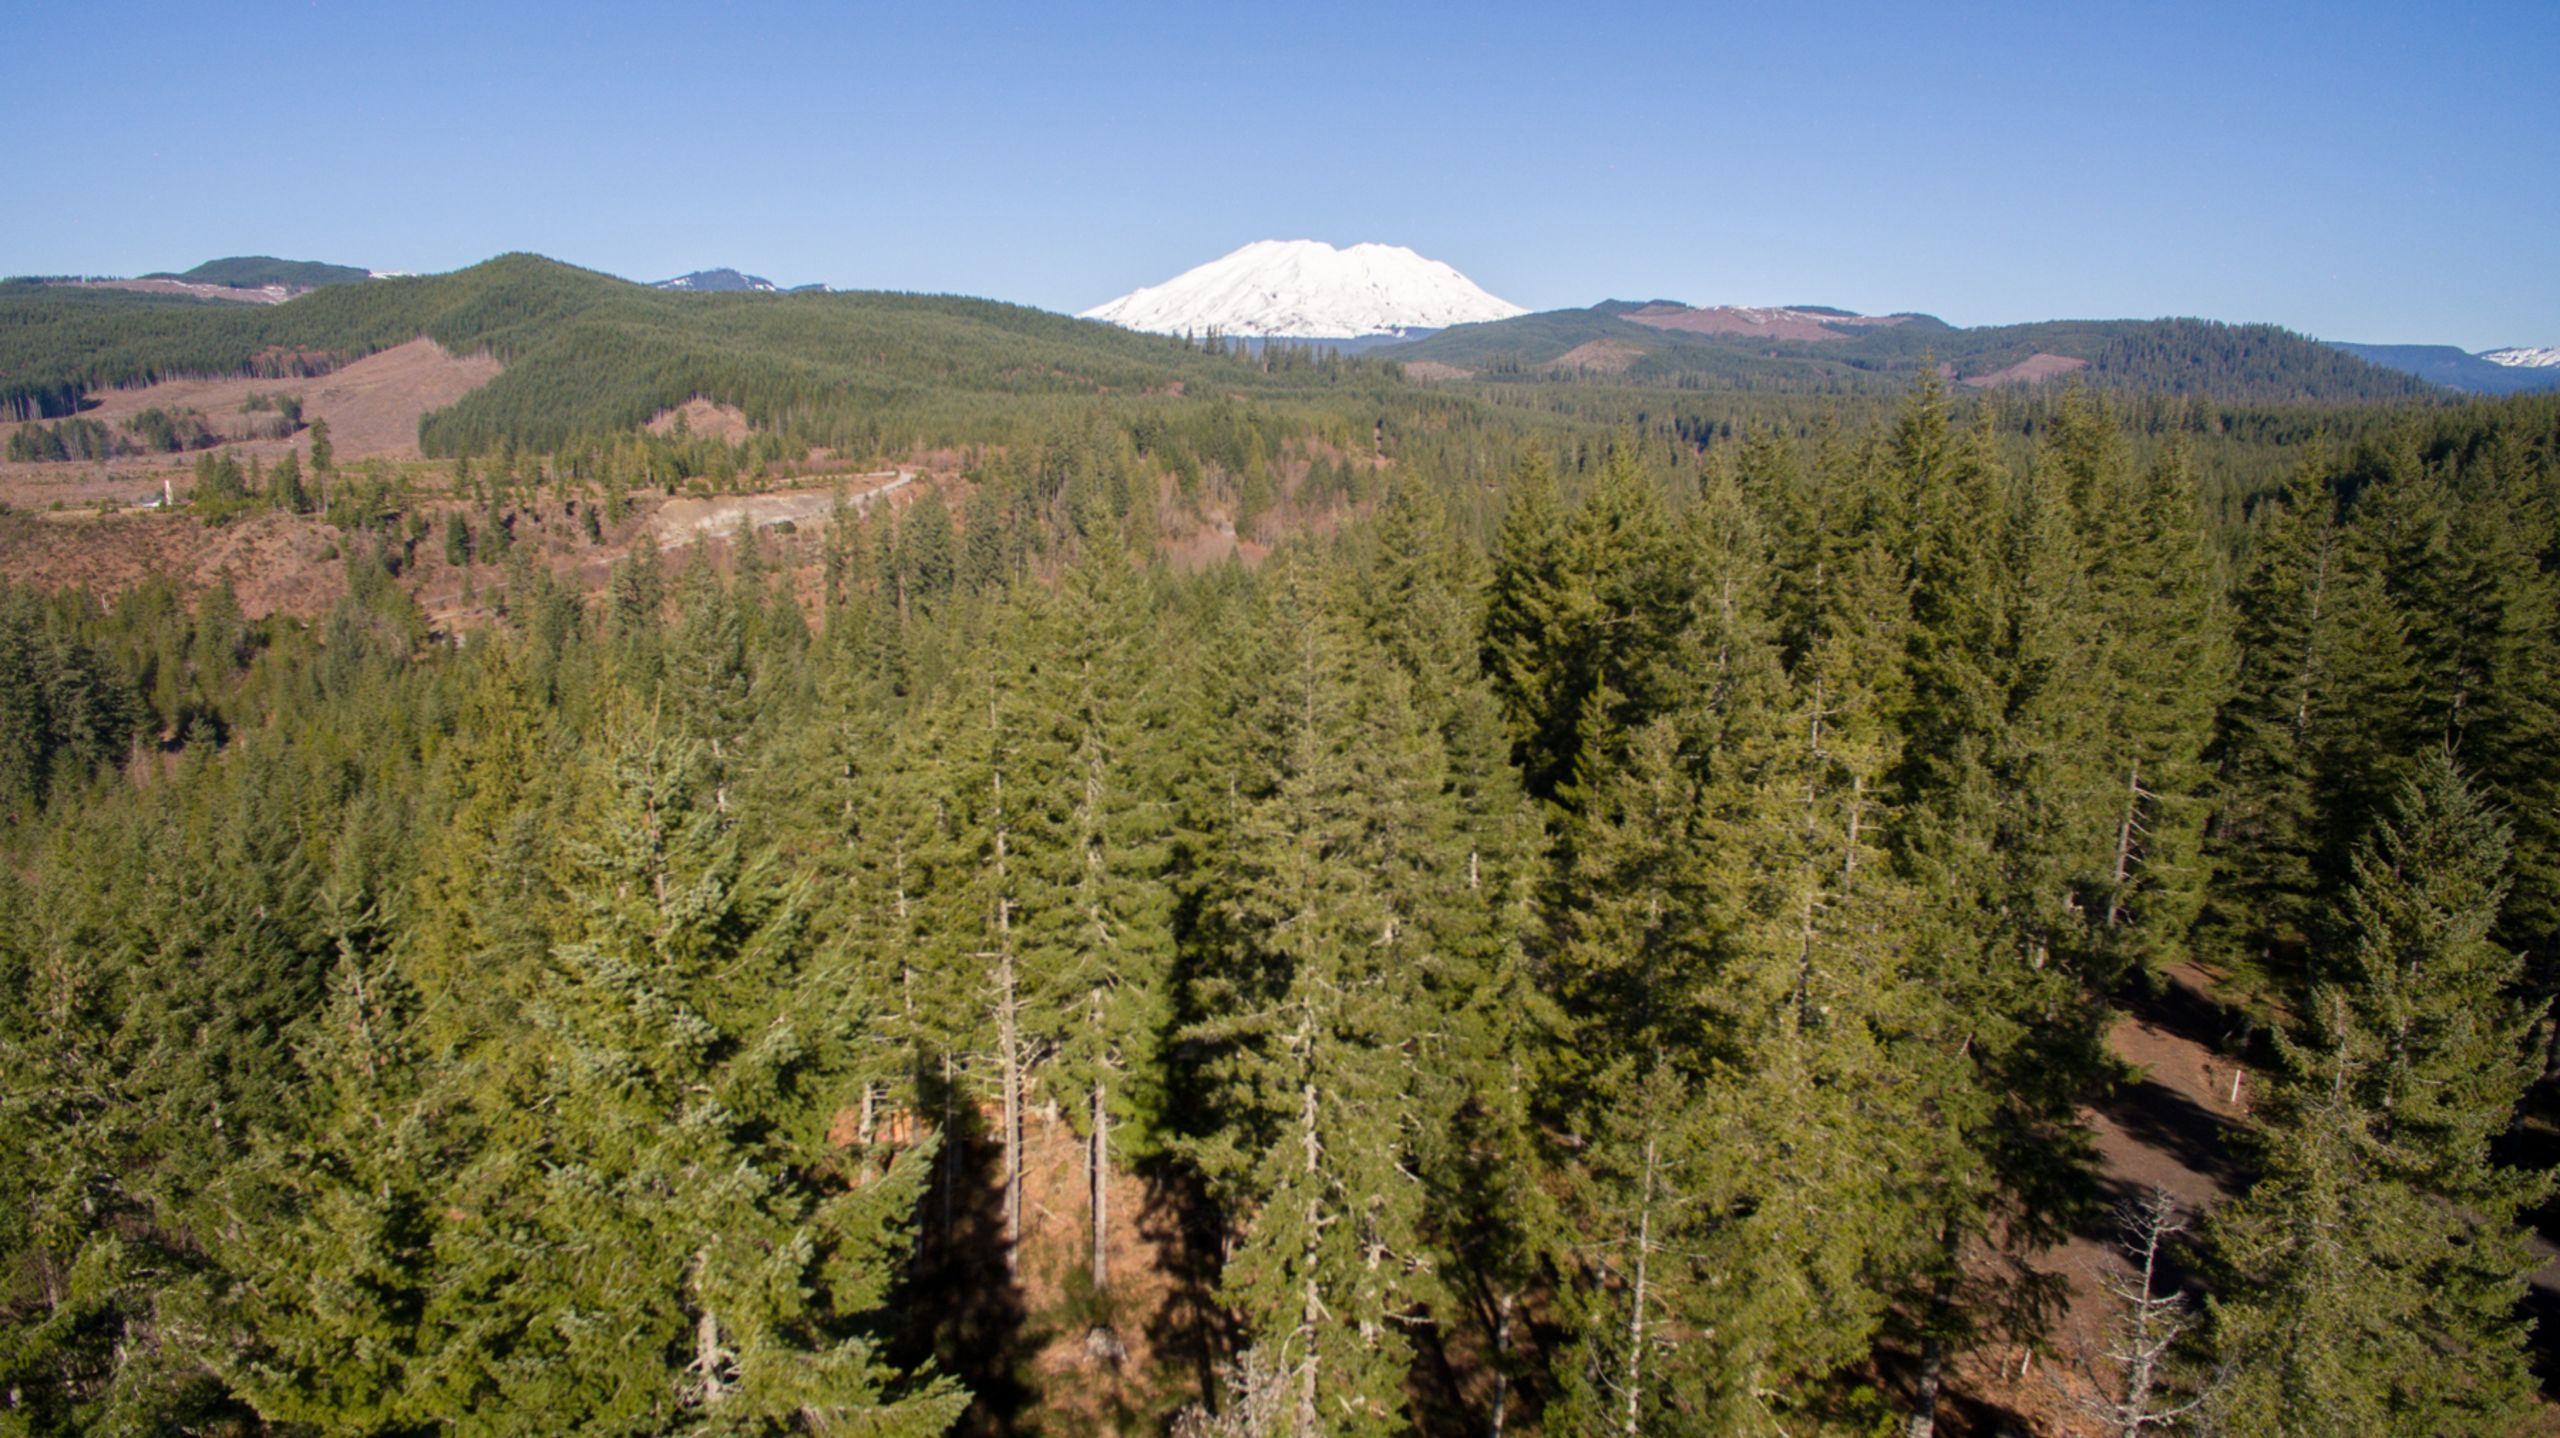 Majestic Mount Saint Helens